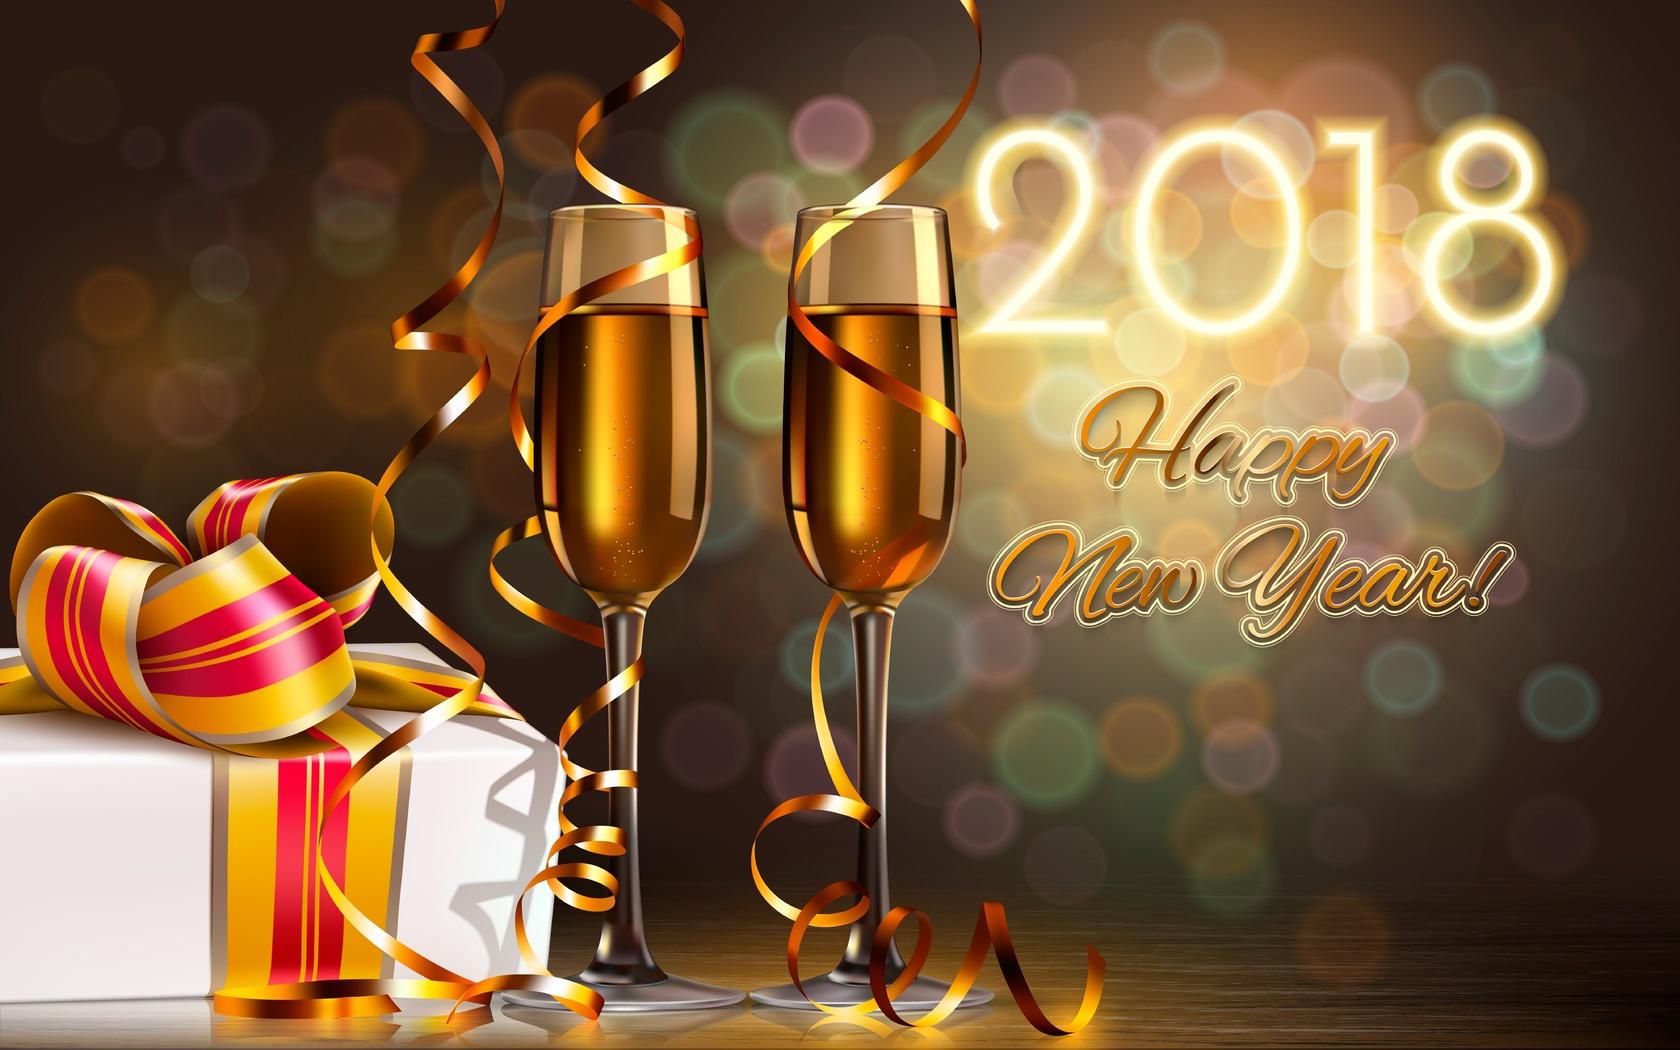 графика, праздник, новый год, коробка, подарок, бокалы, серпантин, боке, 2018